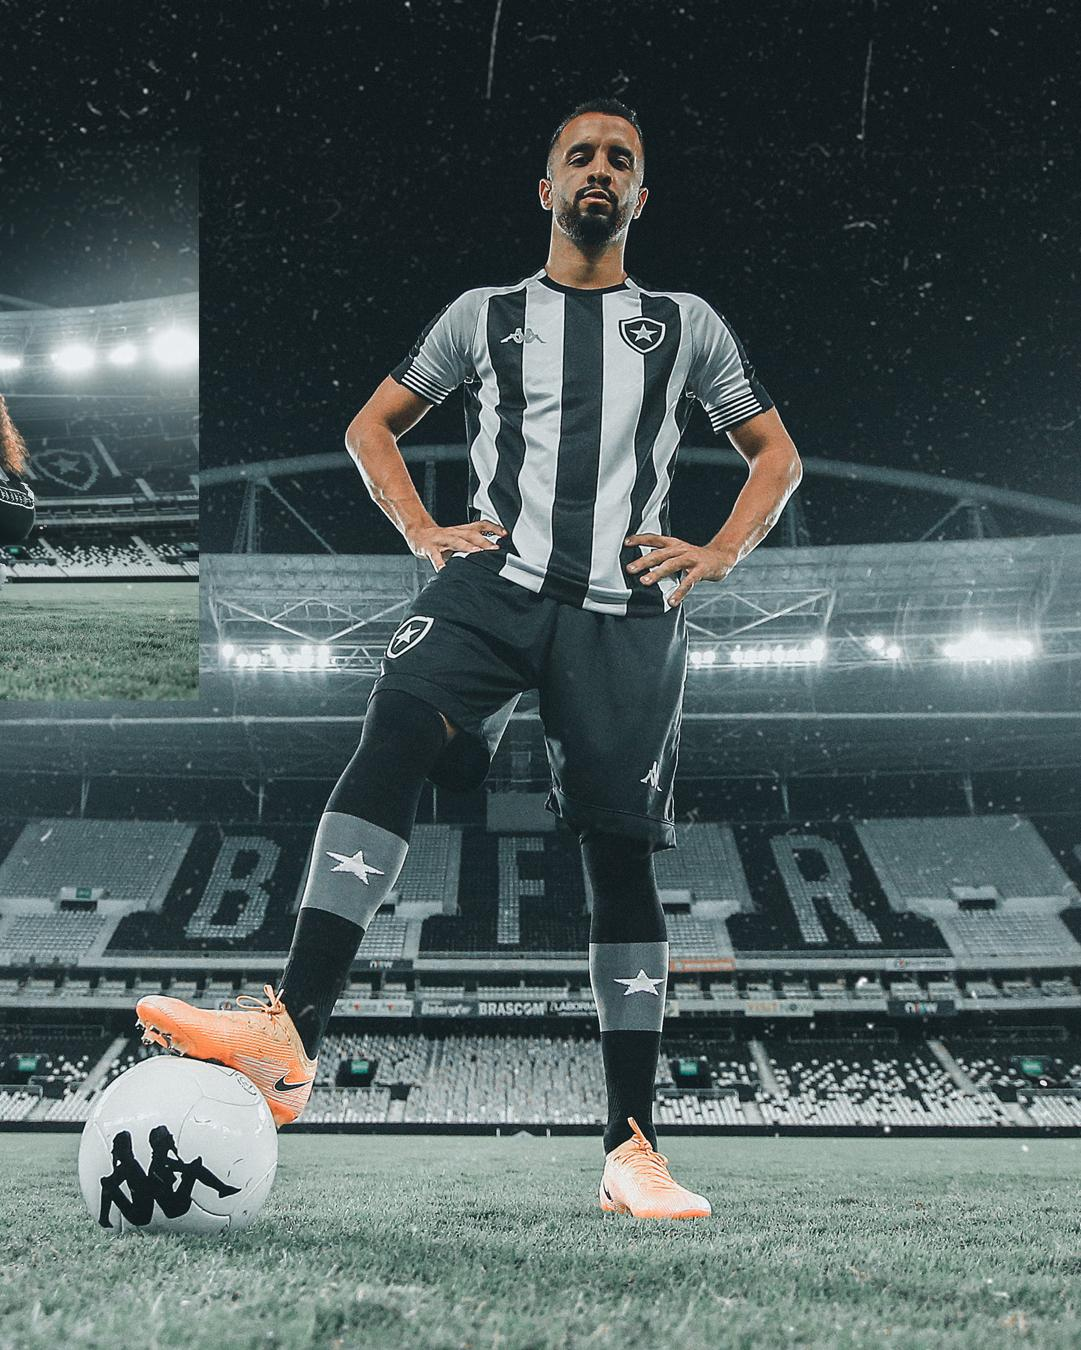 Camiseta Kappa del Botafogo 2020/21 | Imagen Web Oficial